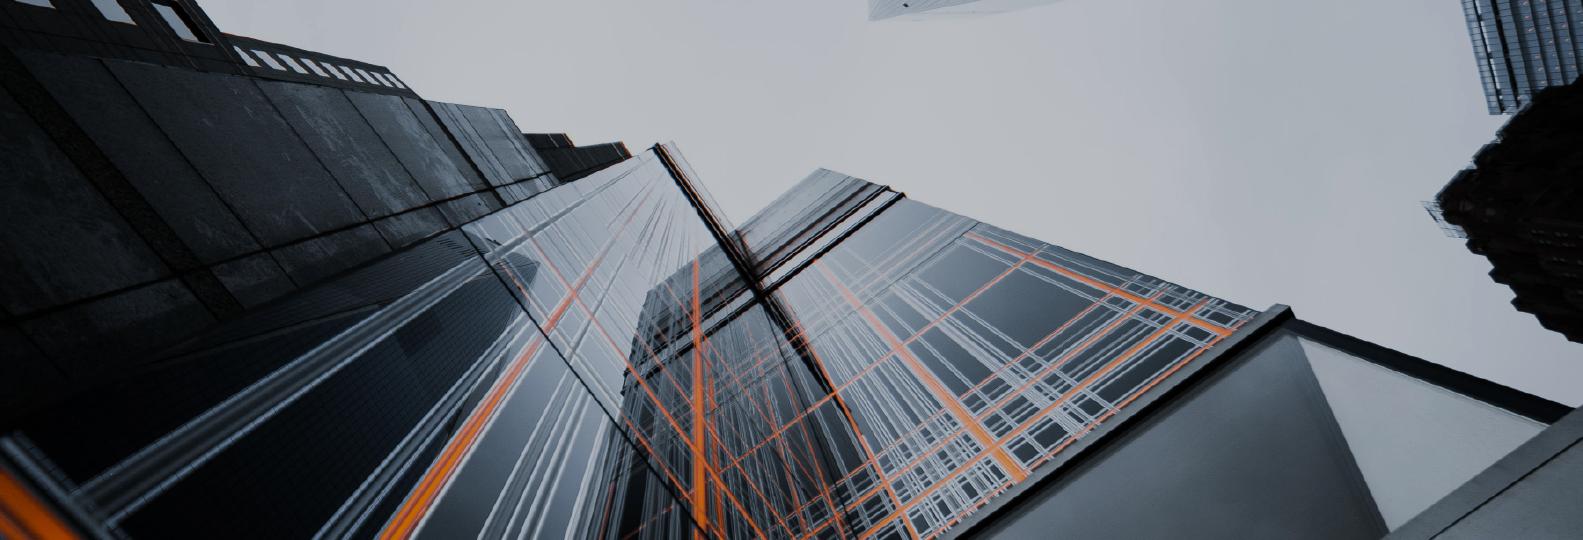 SAP Business One რეპორტები